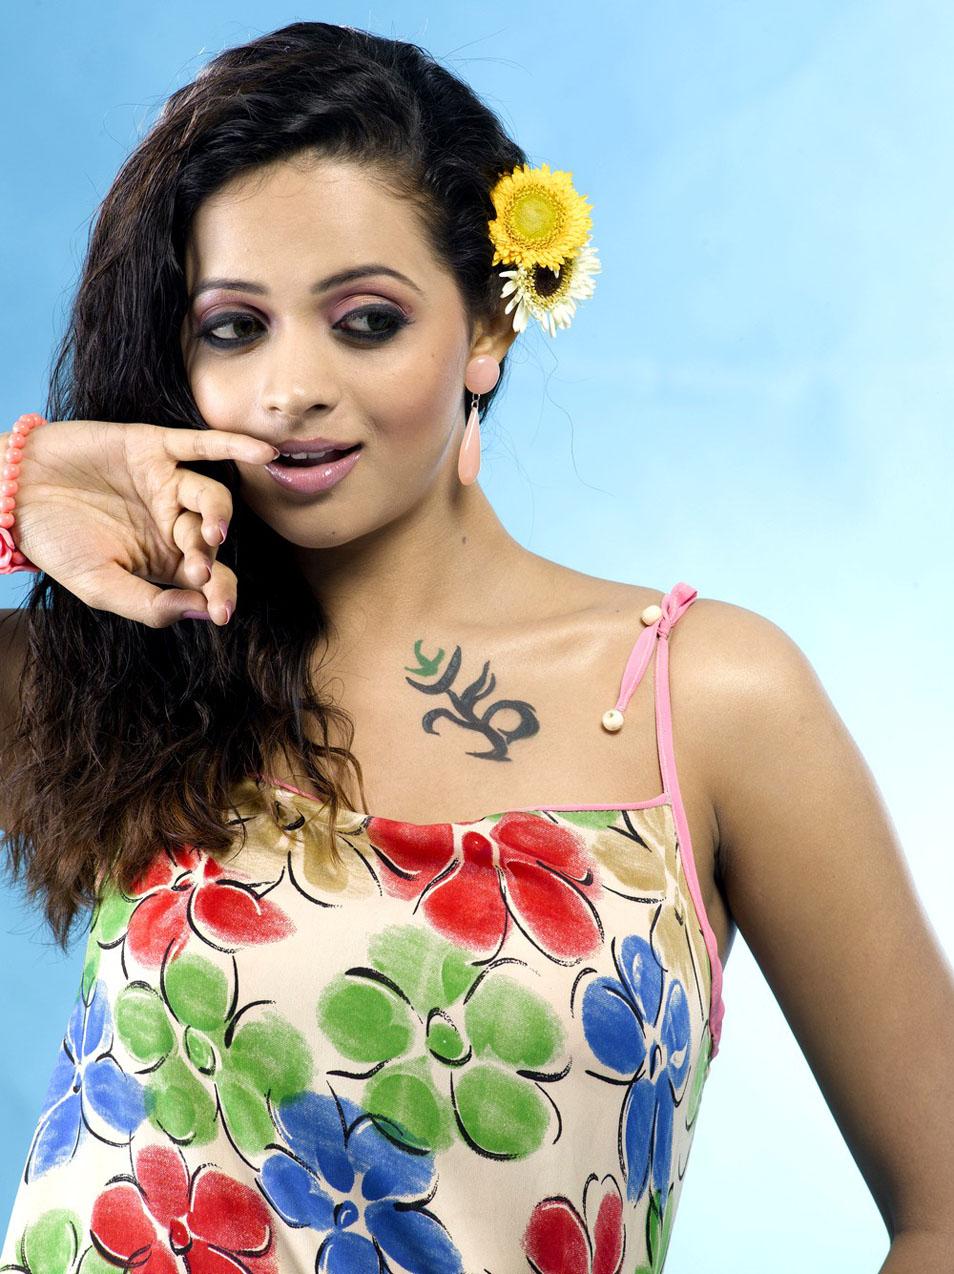 Free Songs Lyrics For You: Hot Actress Bhavana Hot Thigh